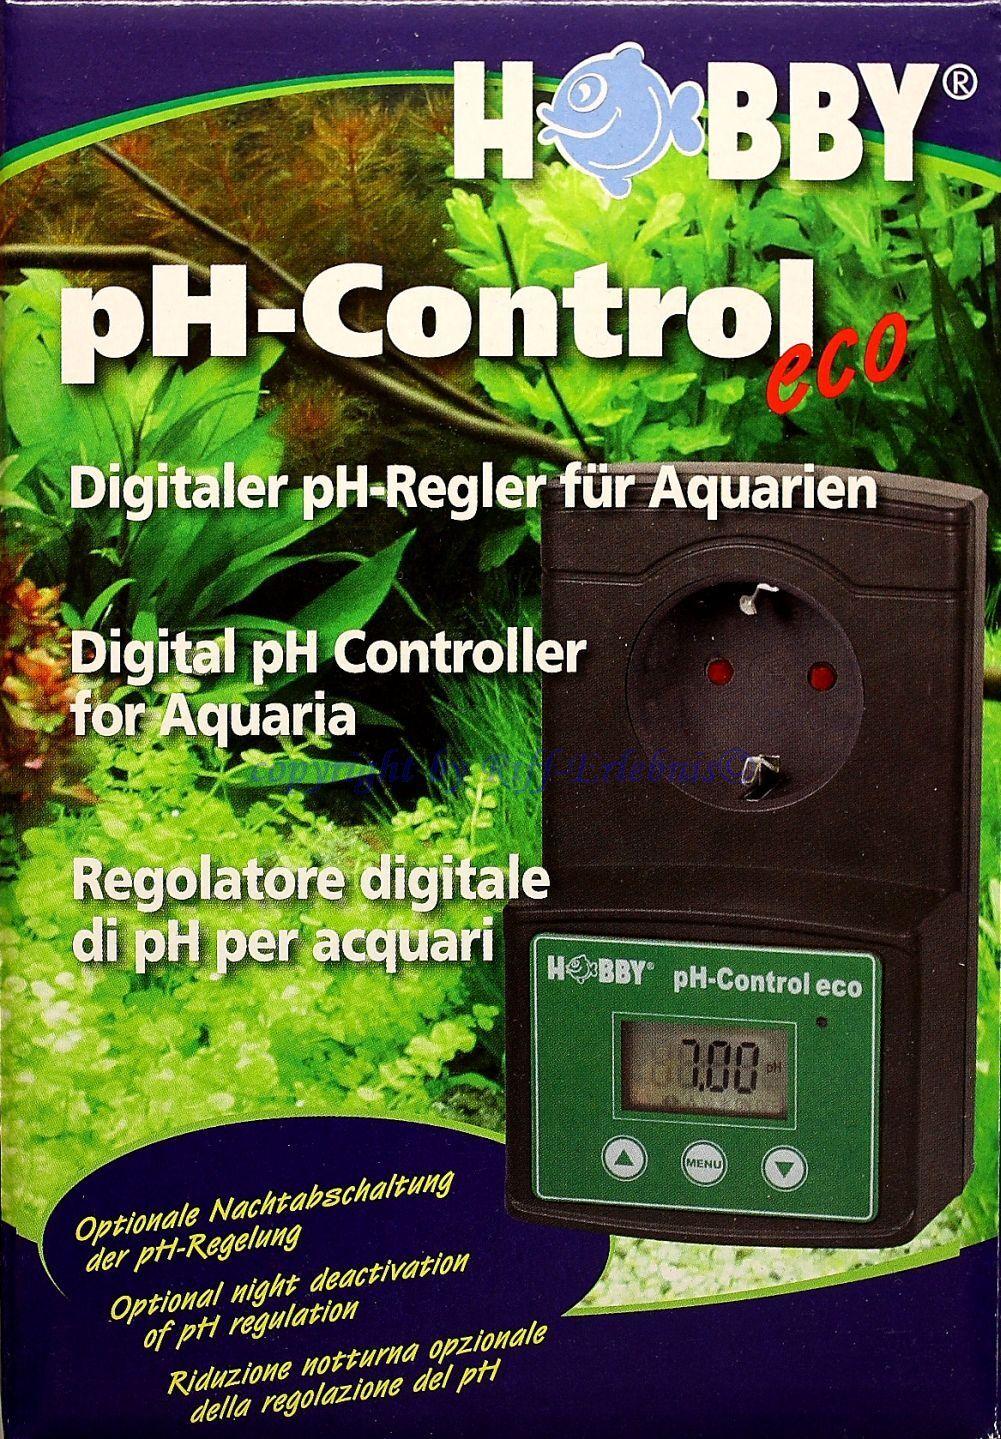 Controllo Ph Eco Hobby Digitale Ph-Regler per Acquari